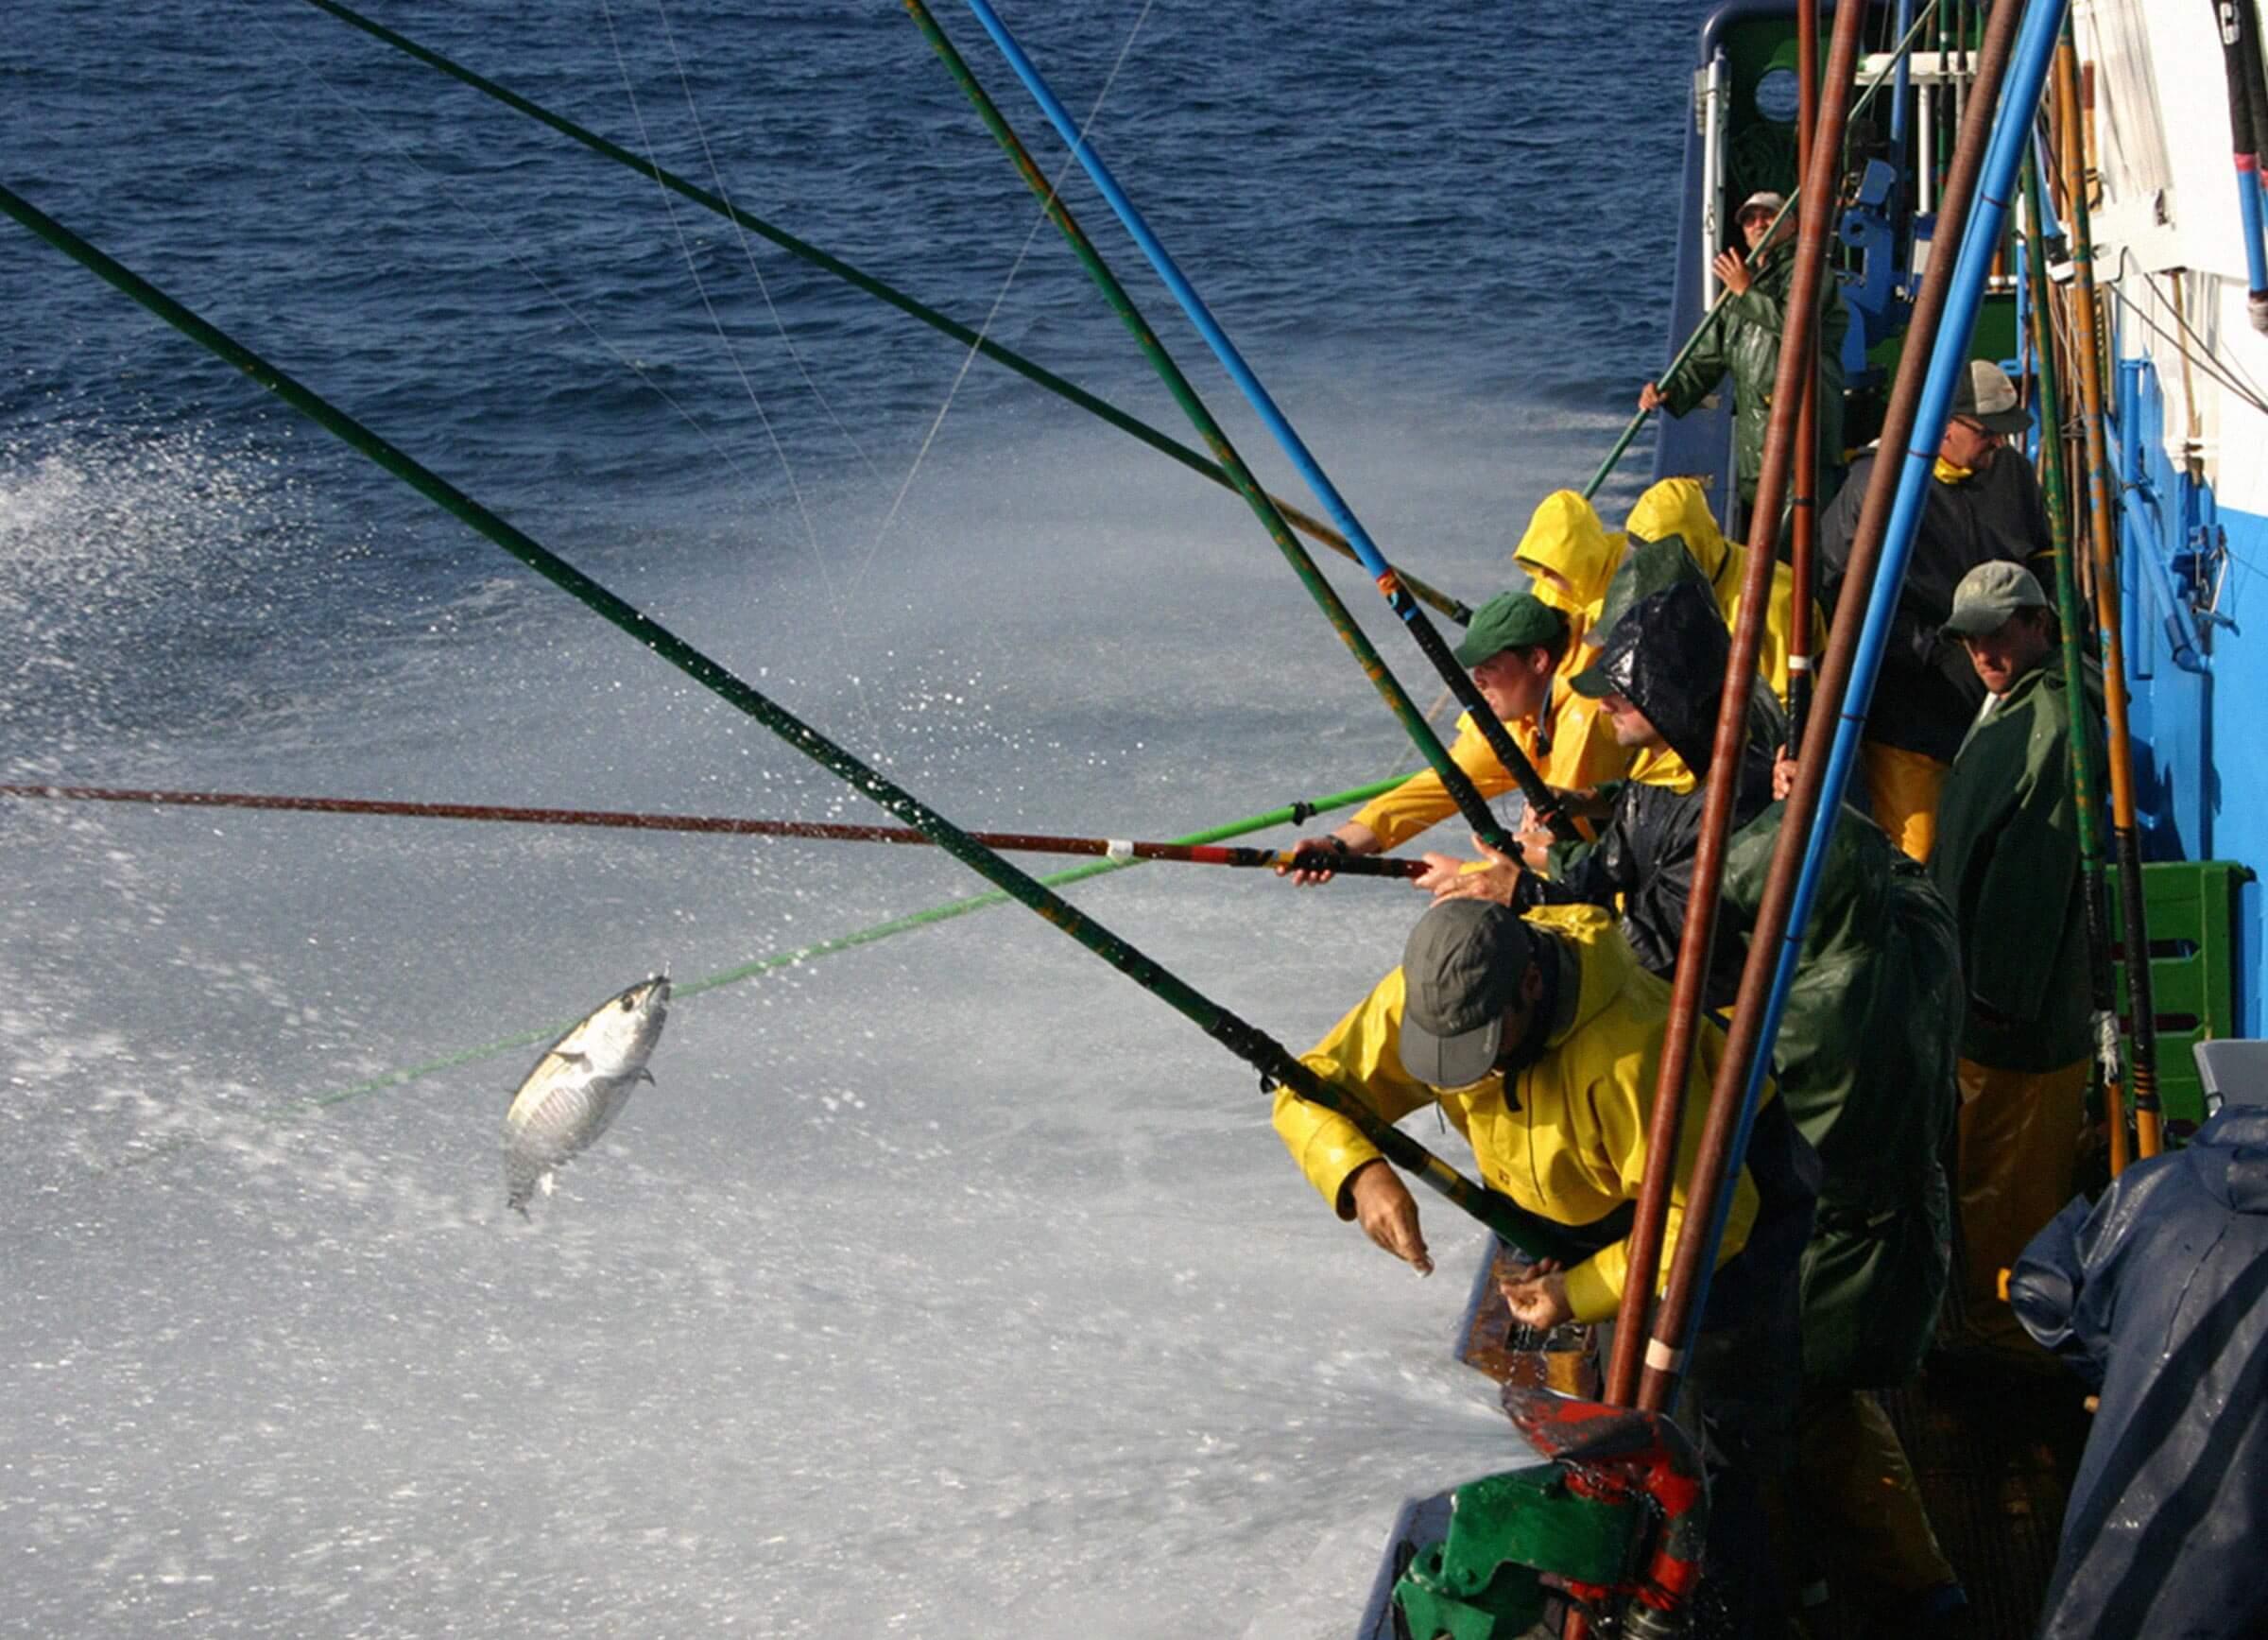 predicion operacional de bonito. Gestion pesquera sostenible